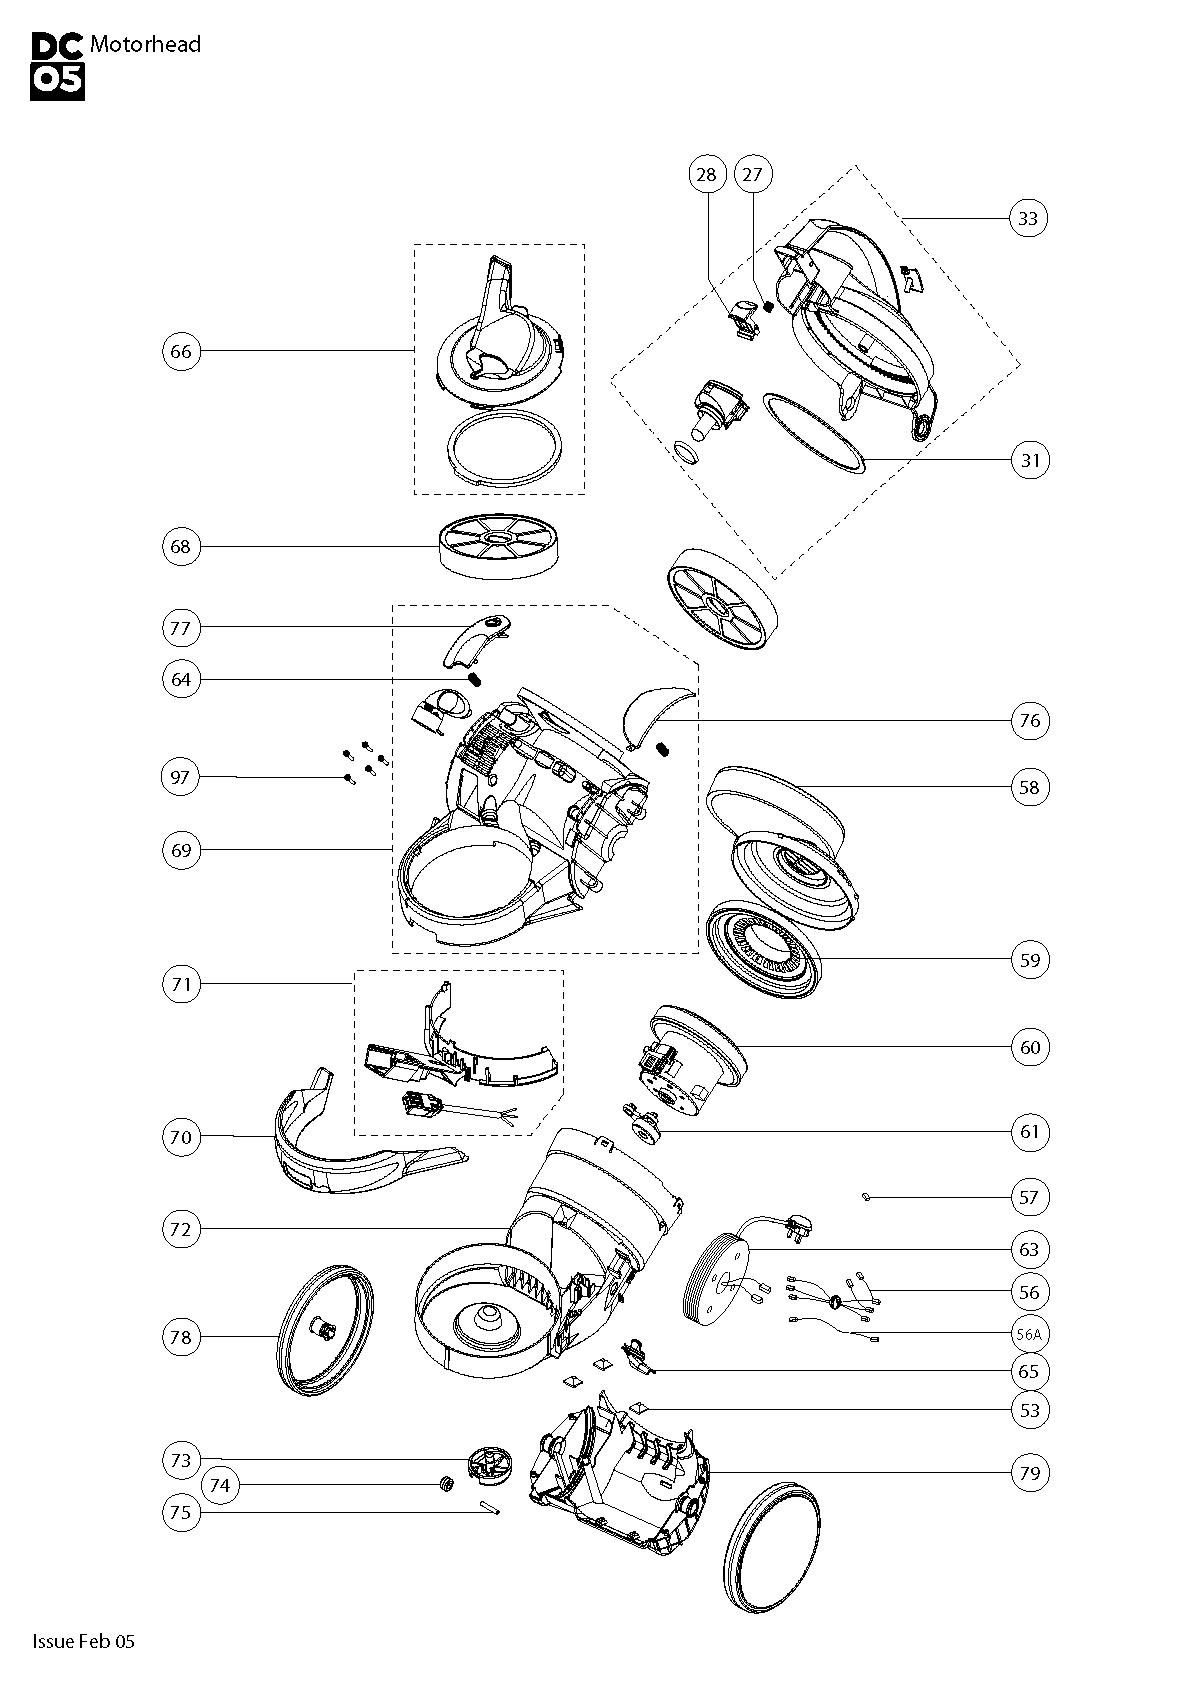 Dyson V6 Motorhead Parts List